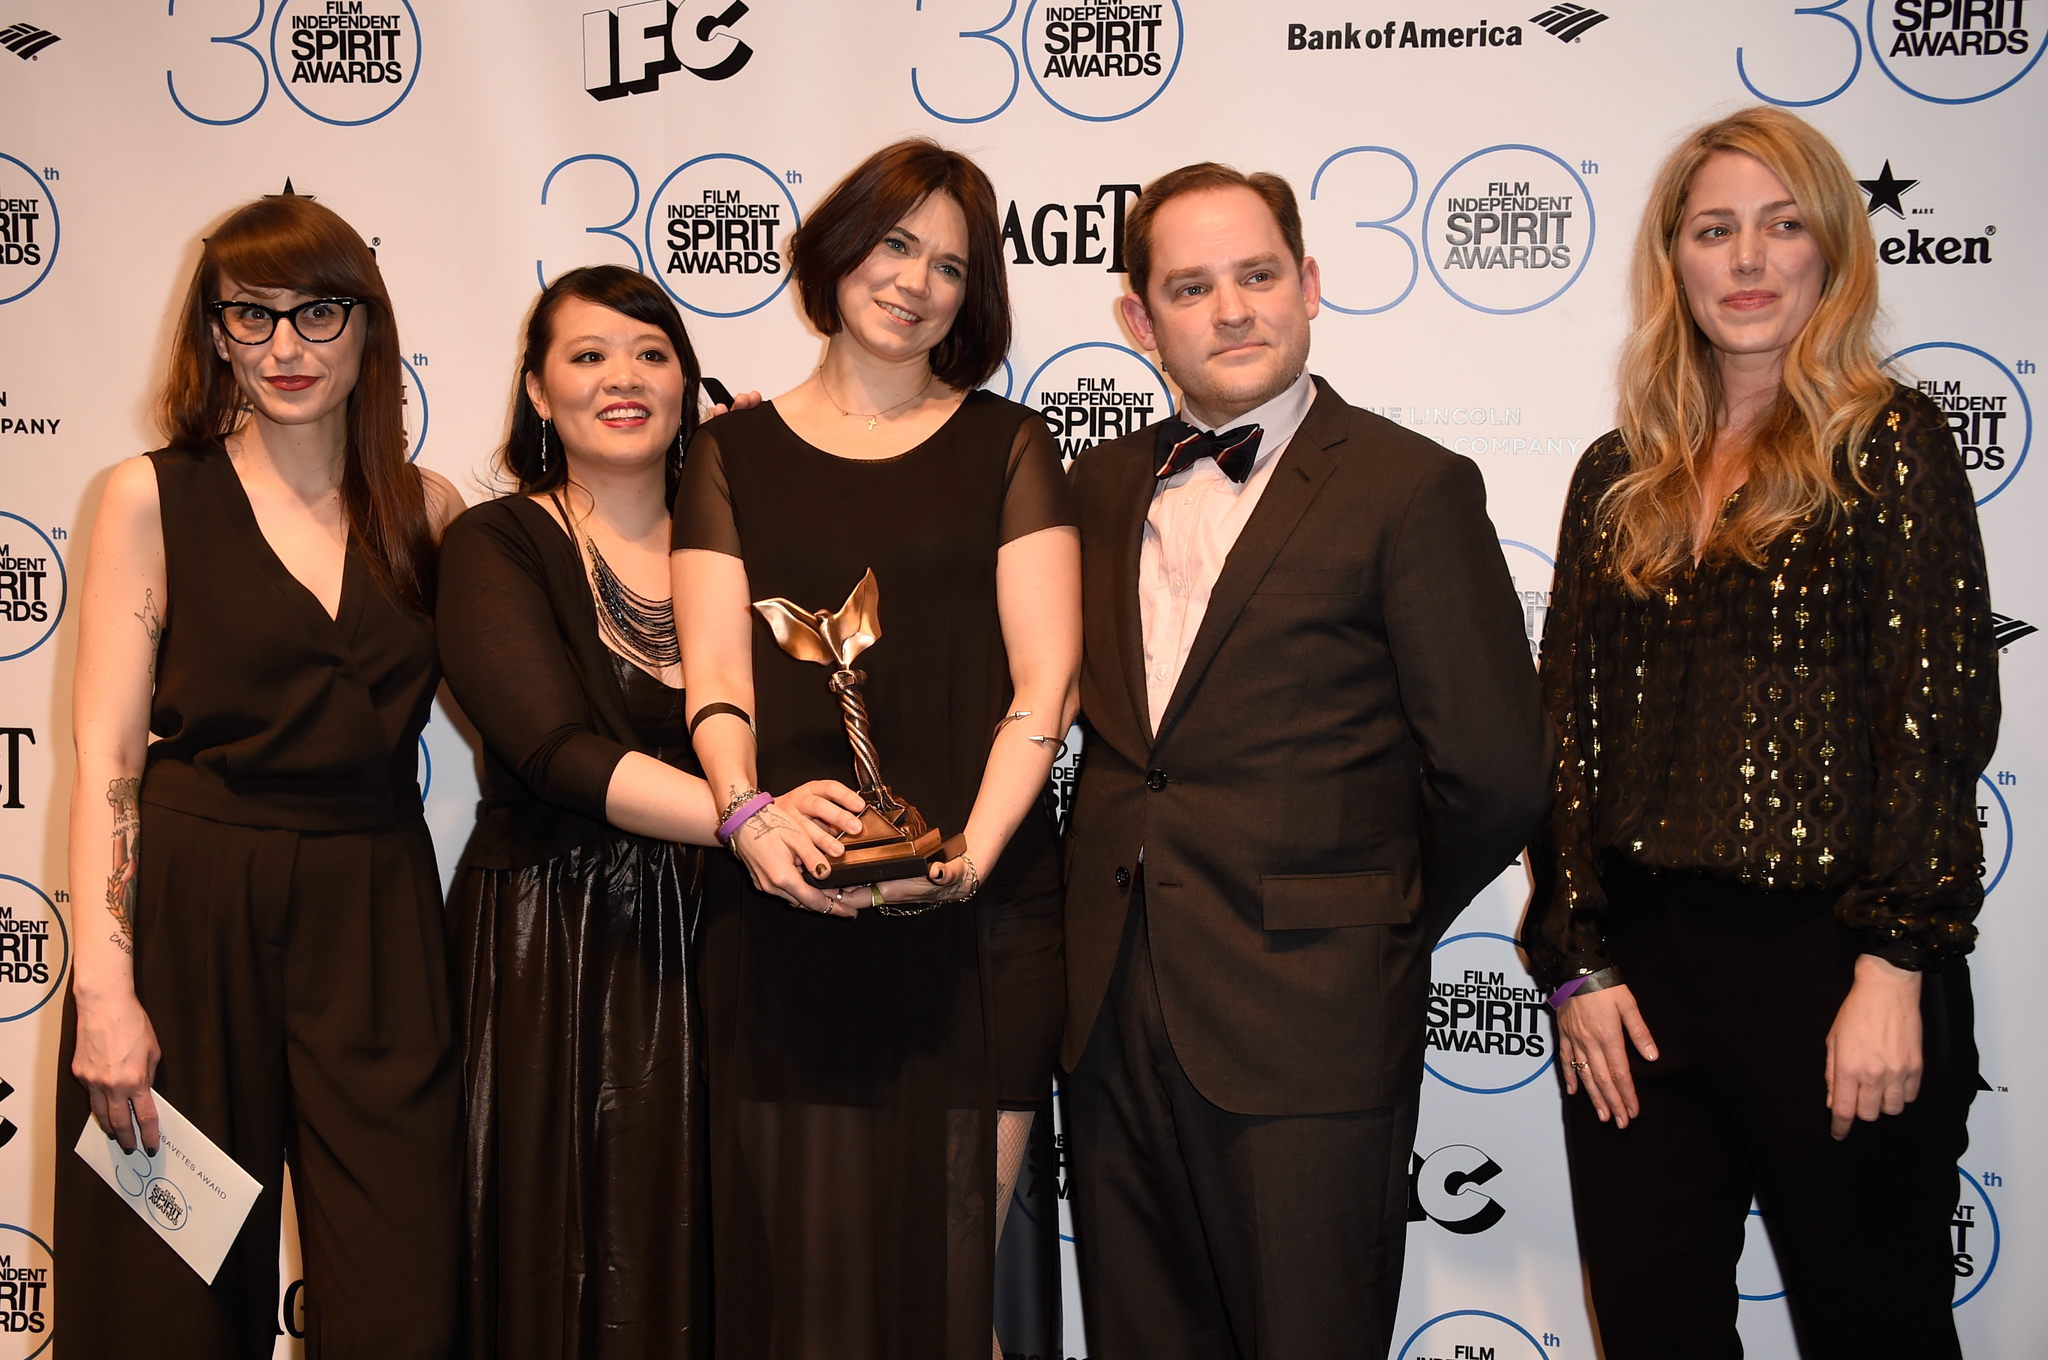 Christina Jennings, Aaron Katz, Martha Stephens, Mynette Louie, and Sara Murphy at an event for 30th Annual Film Independent Spirit Awards (2015)